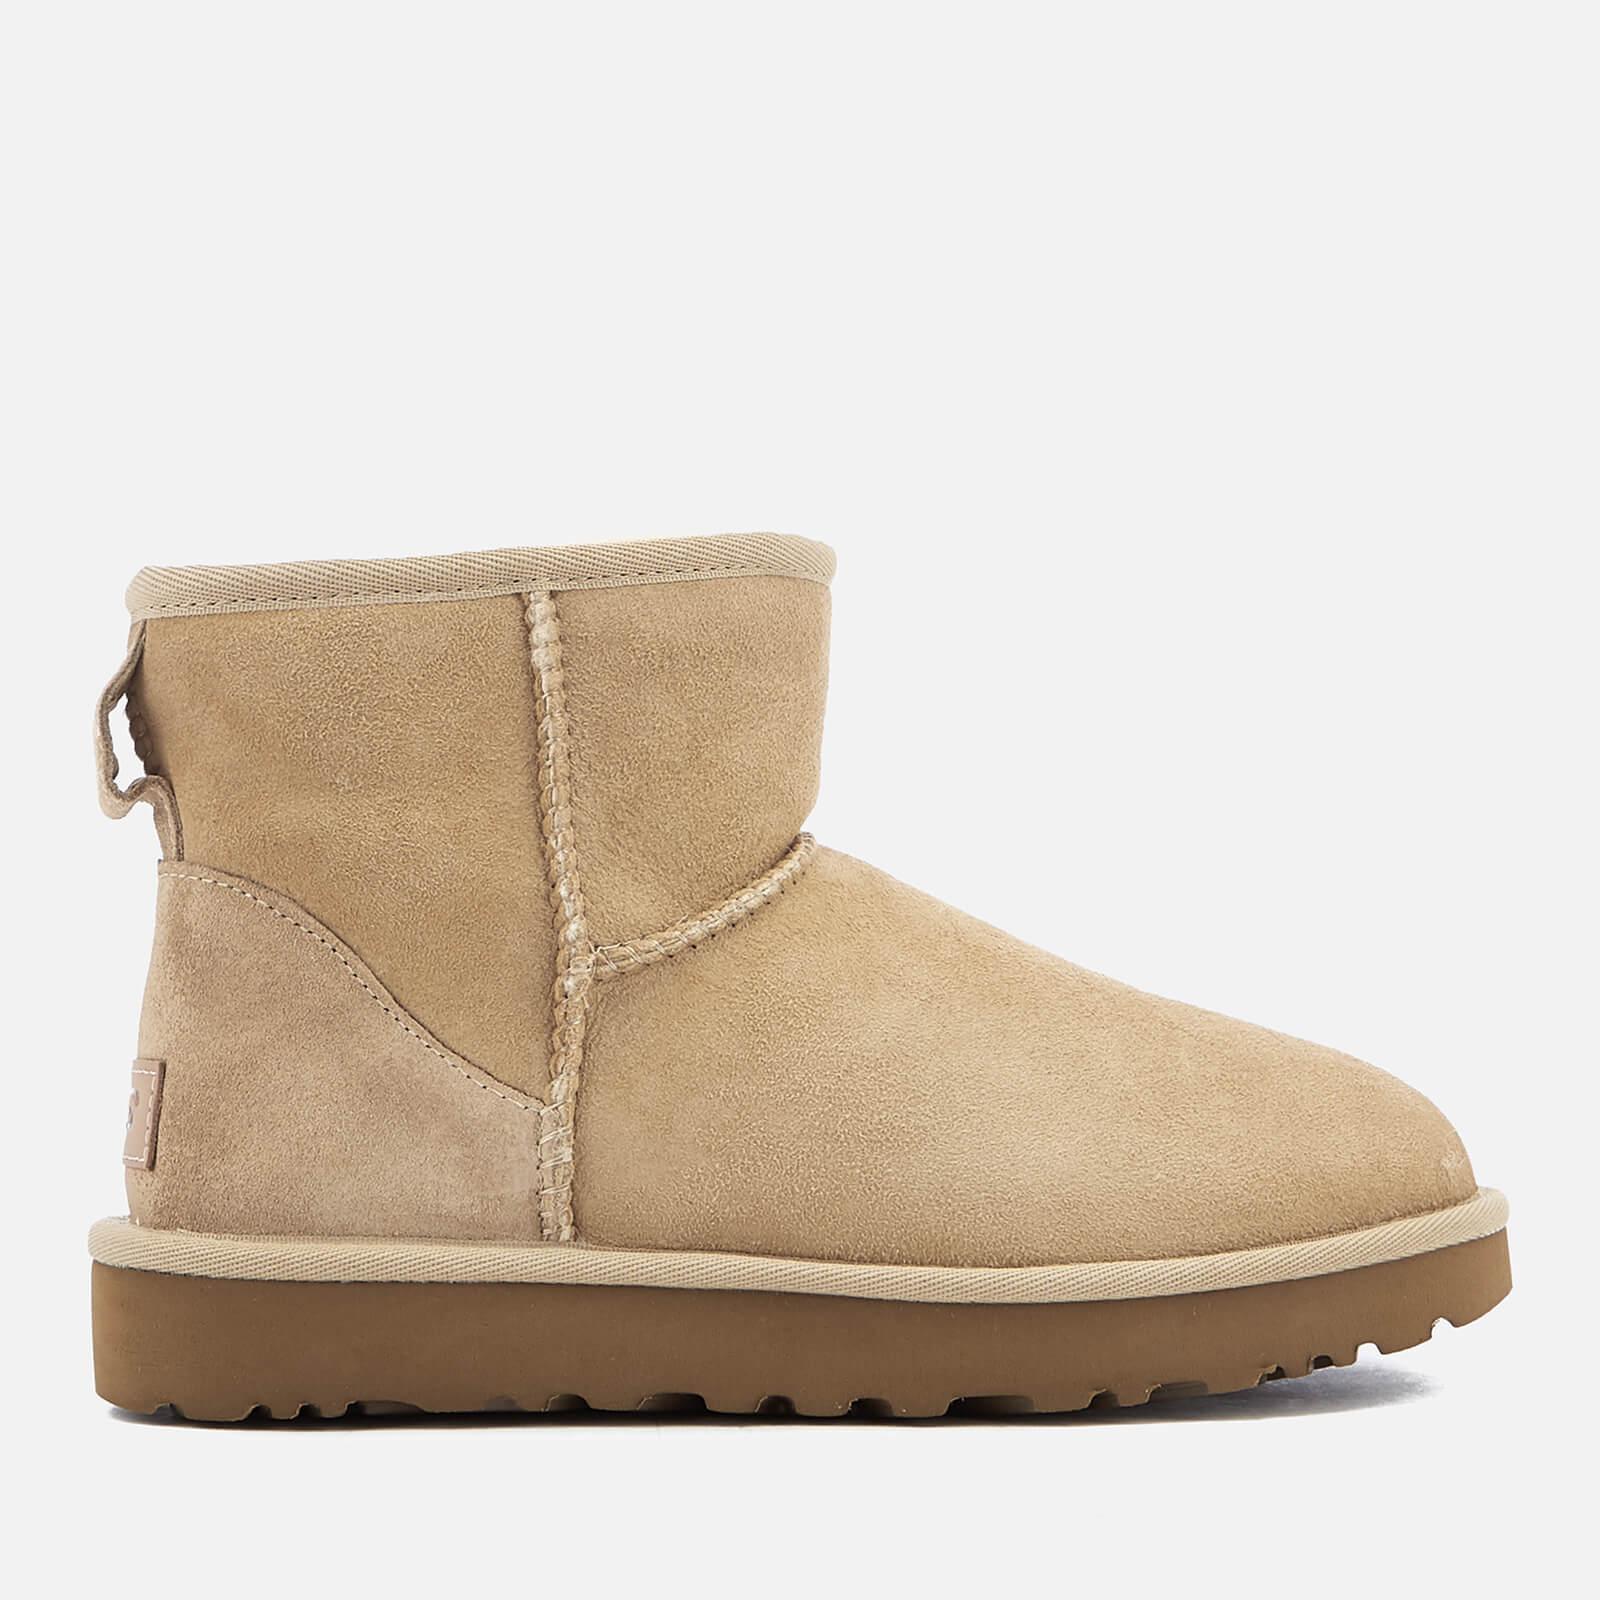 b475291a891 UGG Women's Classic Mini II Sheepskin Boots - Sand